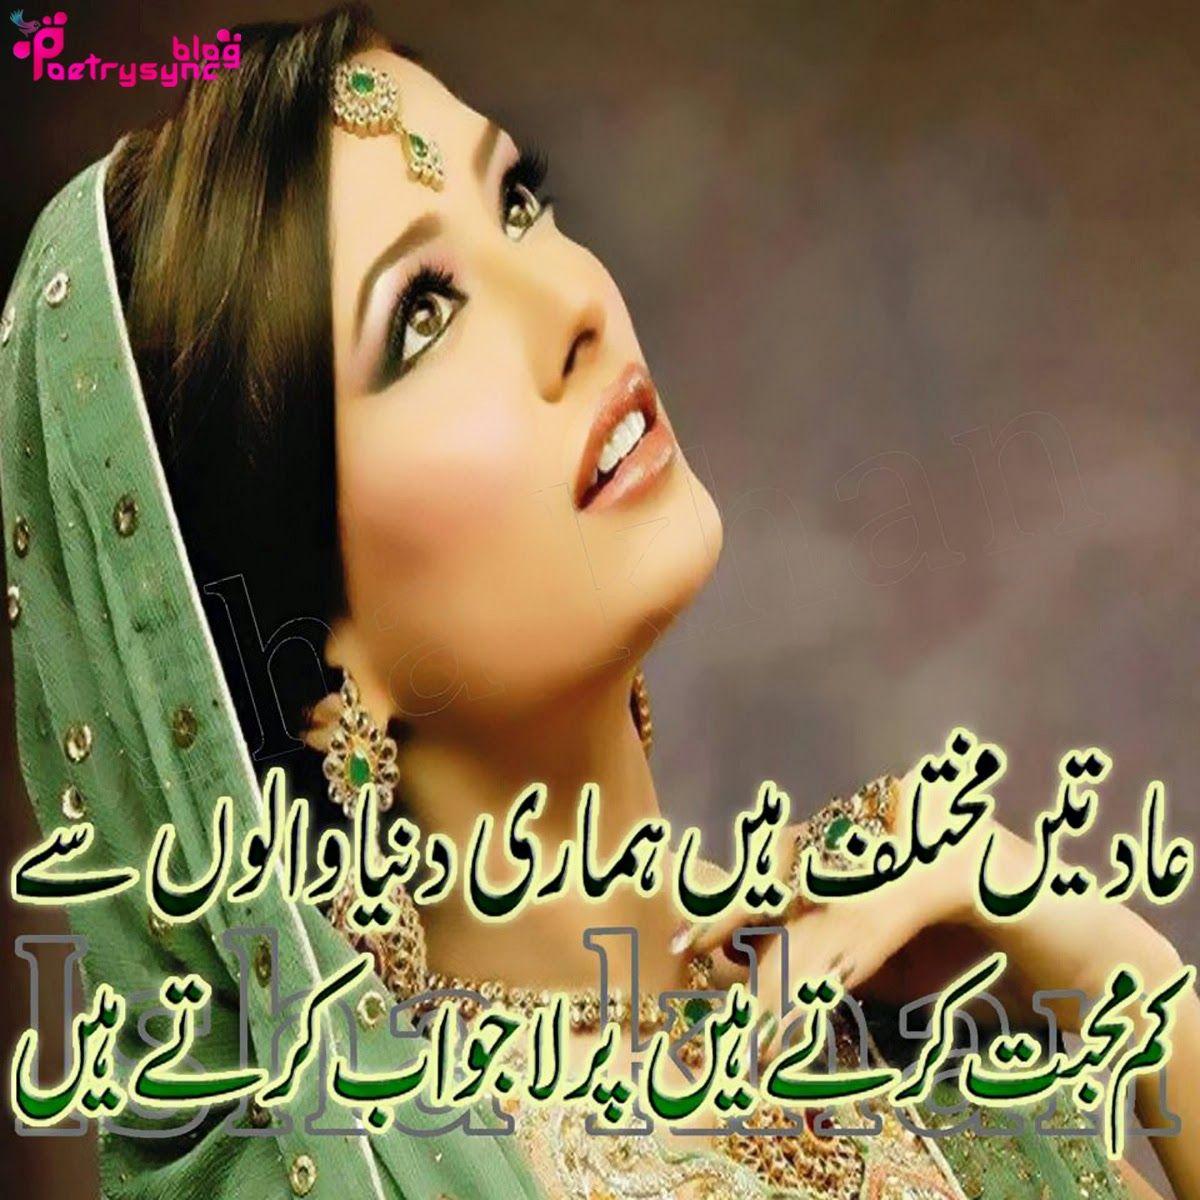 Poetry: Mohabbat Urdu Images Poetry/Shayari for Facebook Timeline